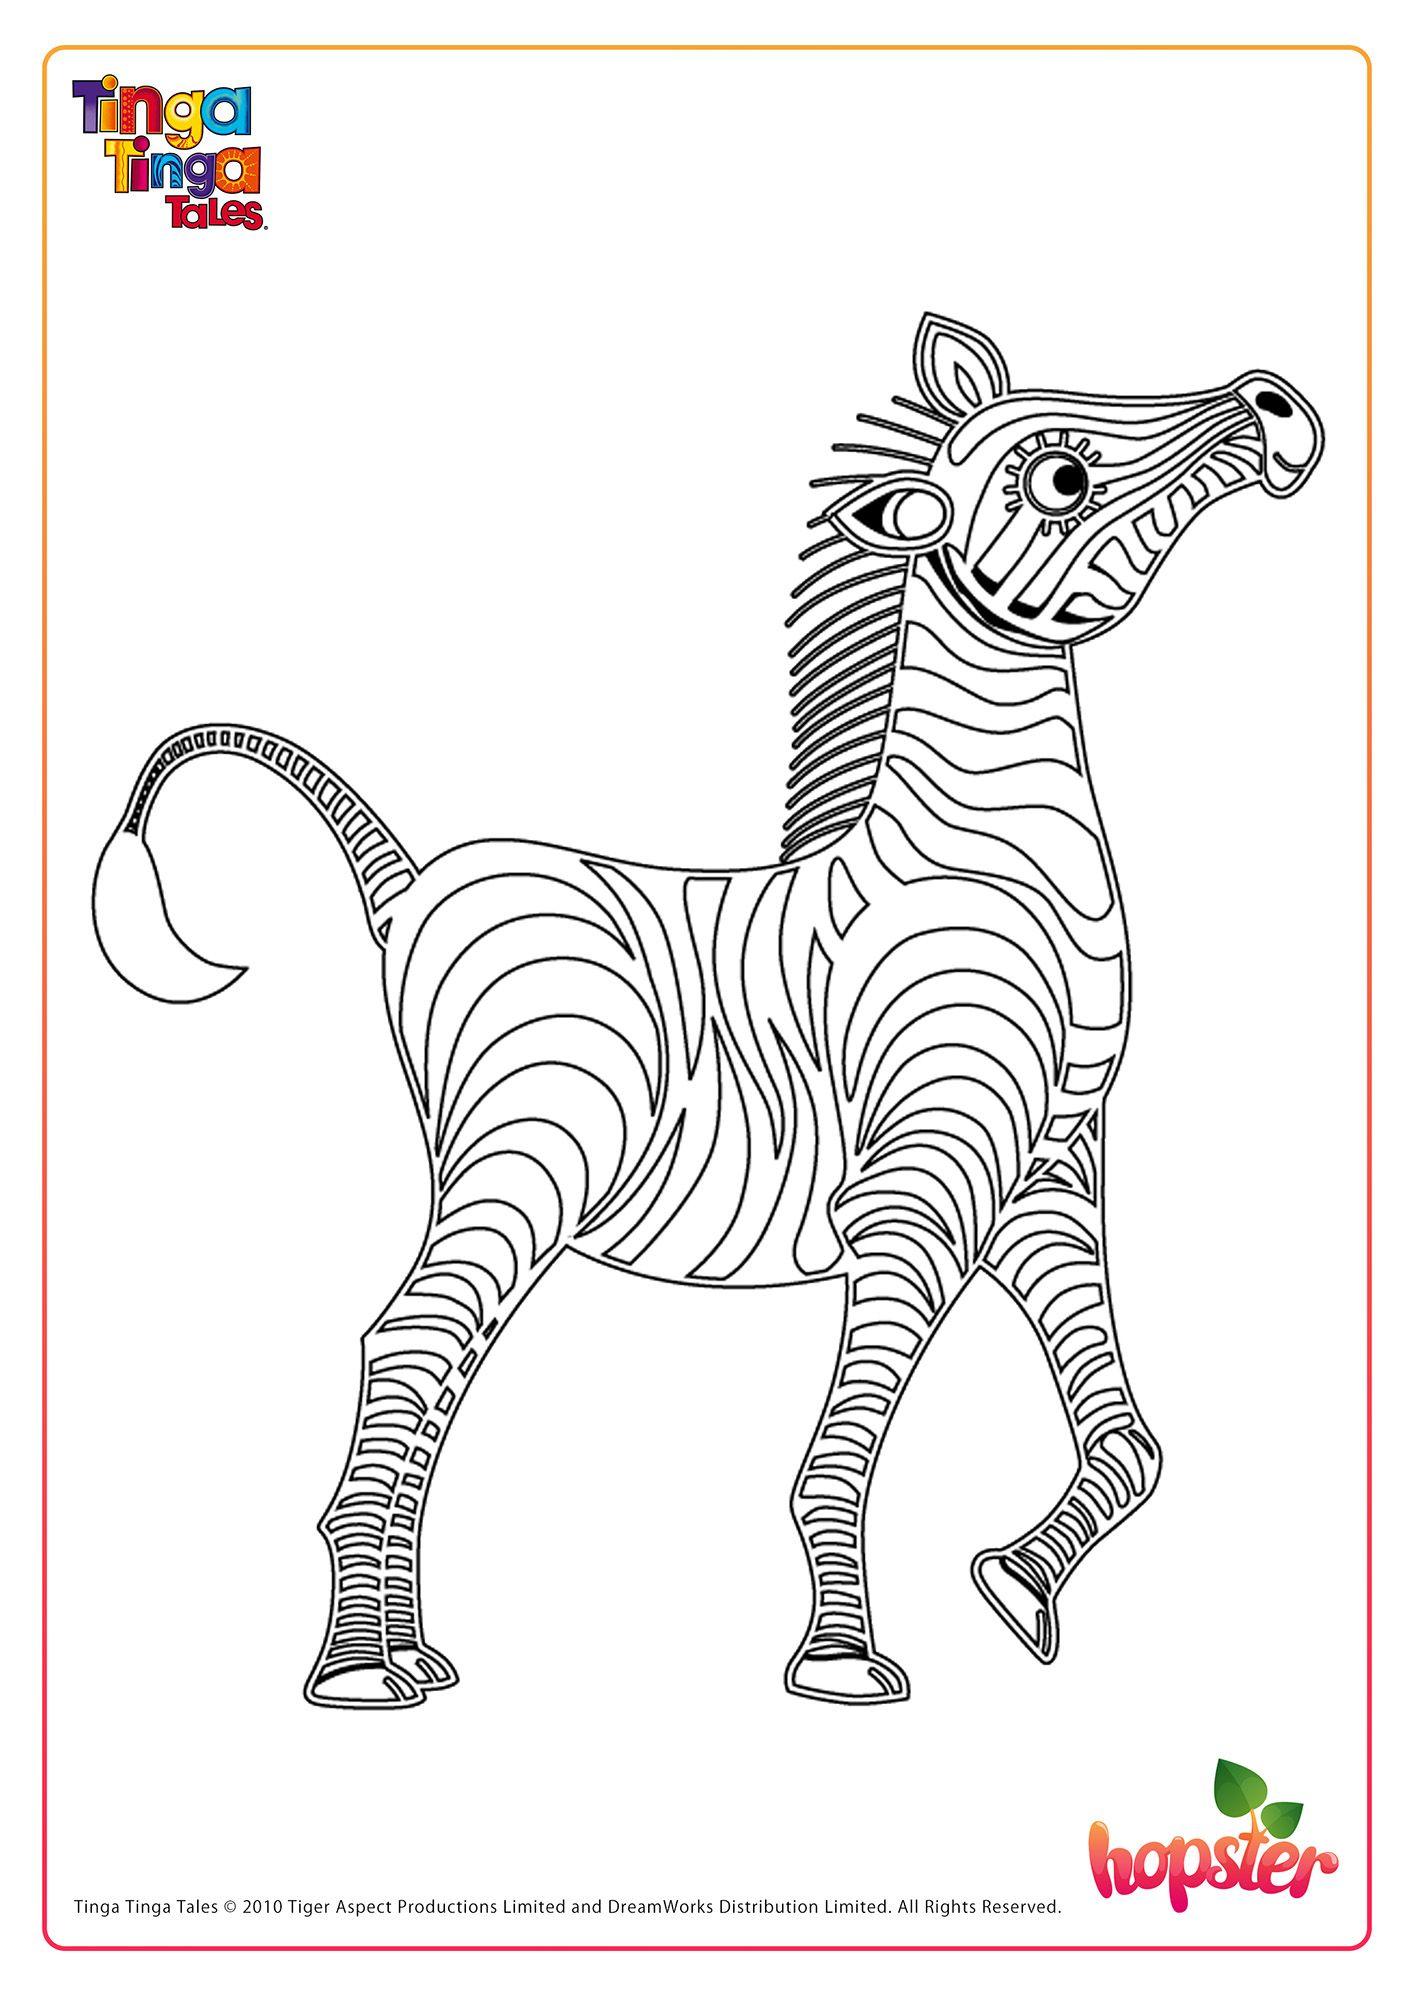 Can You Help Zebra From Tinga Tinga Tales Get His Black Stripes Back Fun Printables For Kids Free Kids Fun Printables